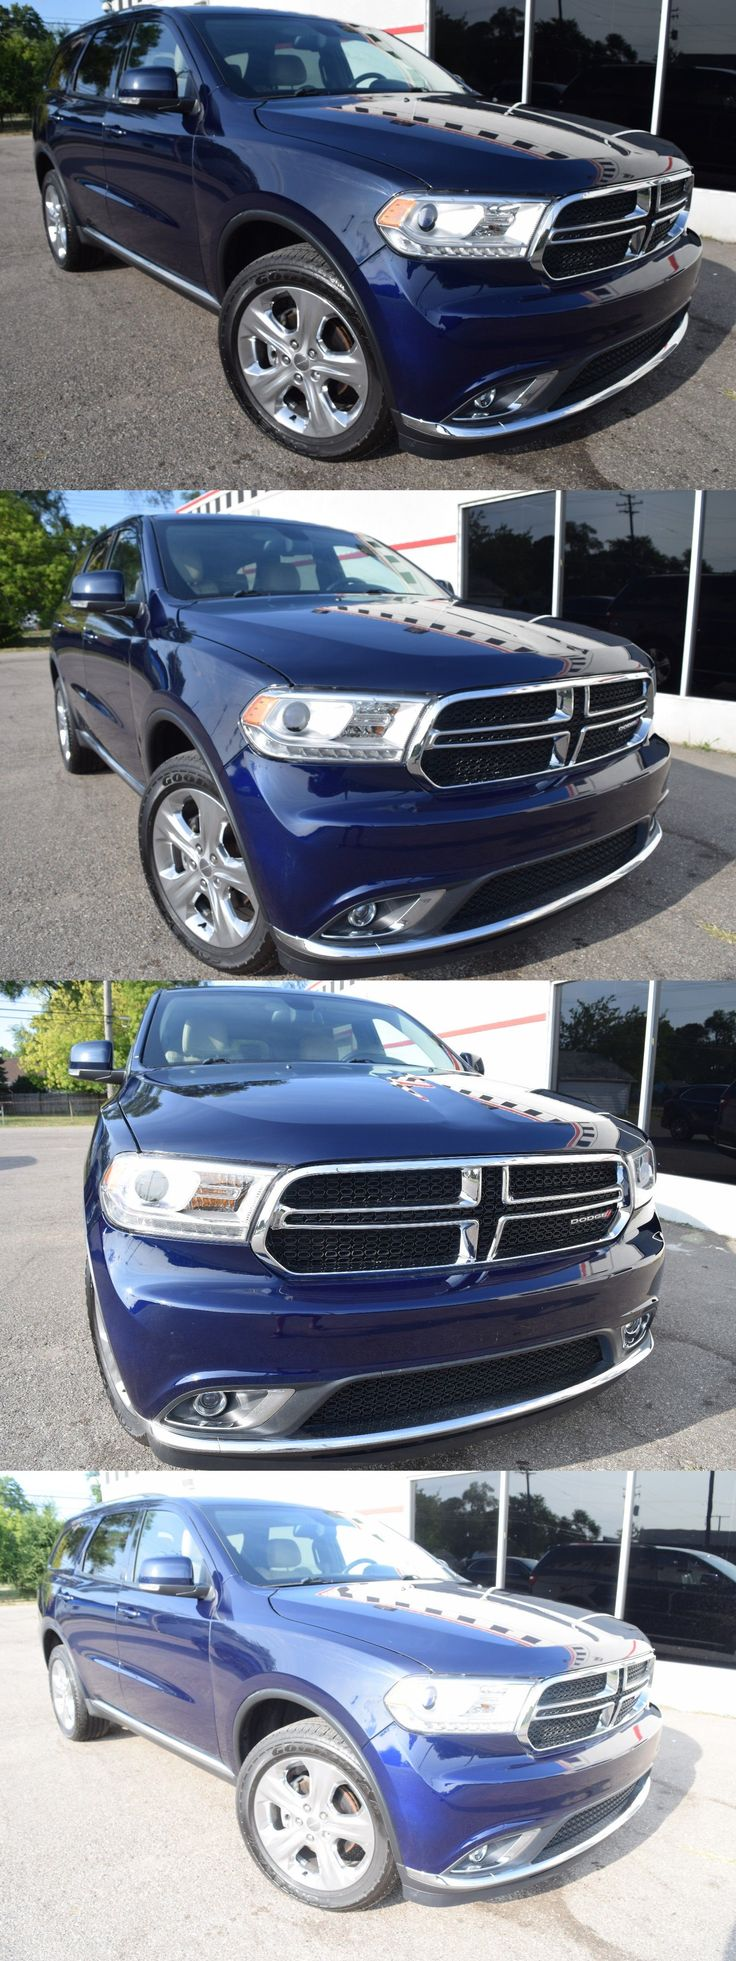 SUVs: 2014 Dodge Durango Awd Limited-Edition(Three Row Seats) Suv 2014 Dodge Durango Awd Limited-Edition(Three Row Seats) Suv -> BUY IT NOW ONLY: $22400 on eBay!